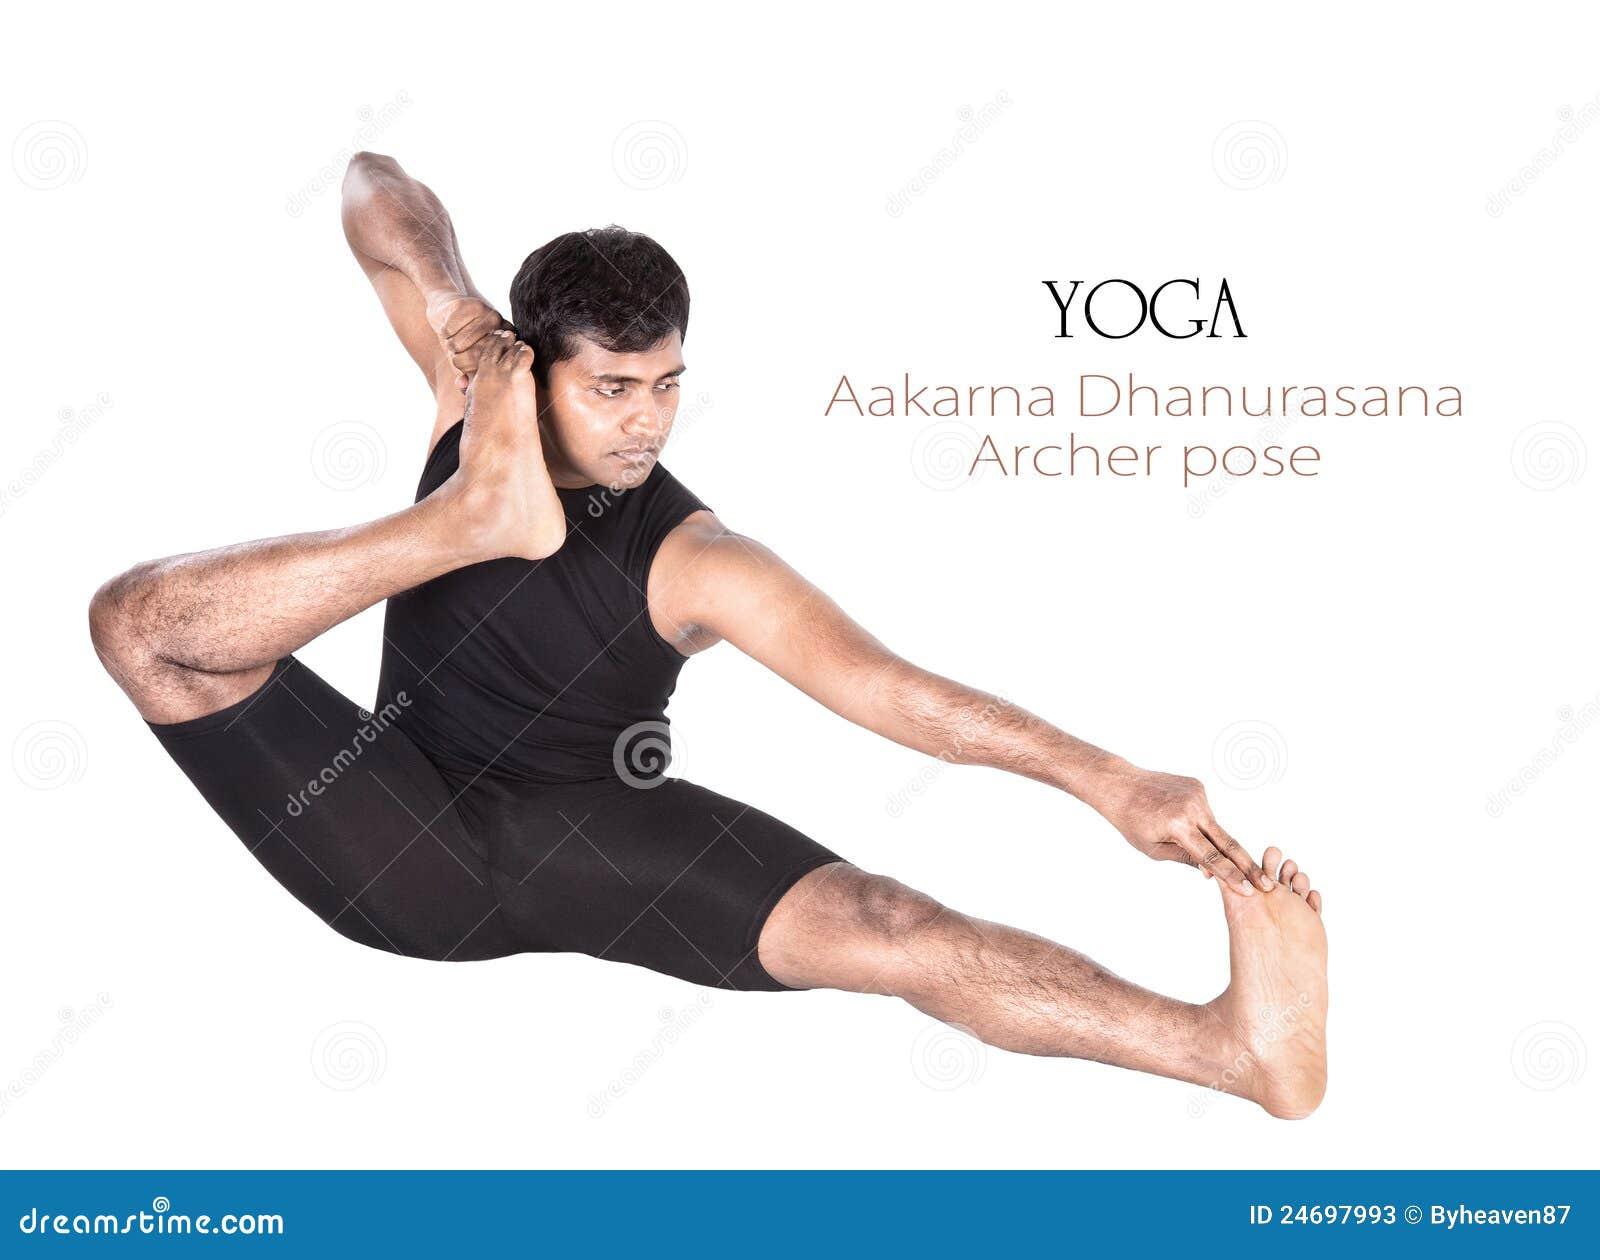 Yoga Aakarna Dhanurasana Archer Pose Stock Image Image